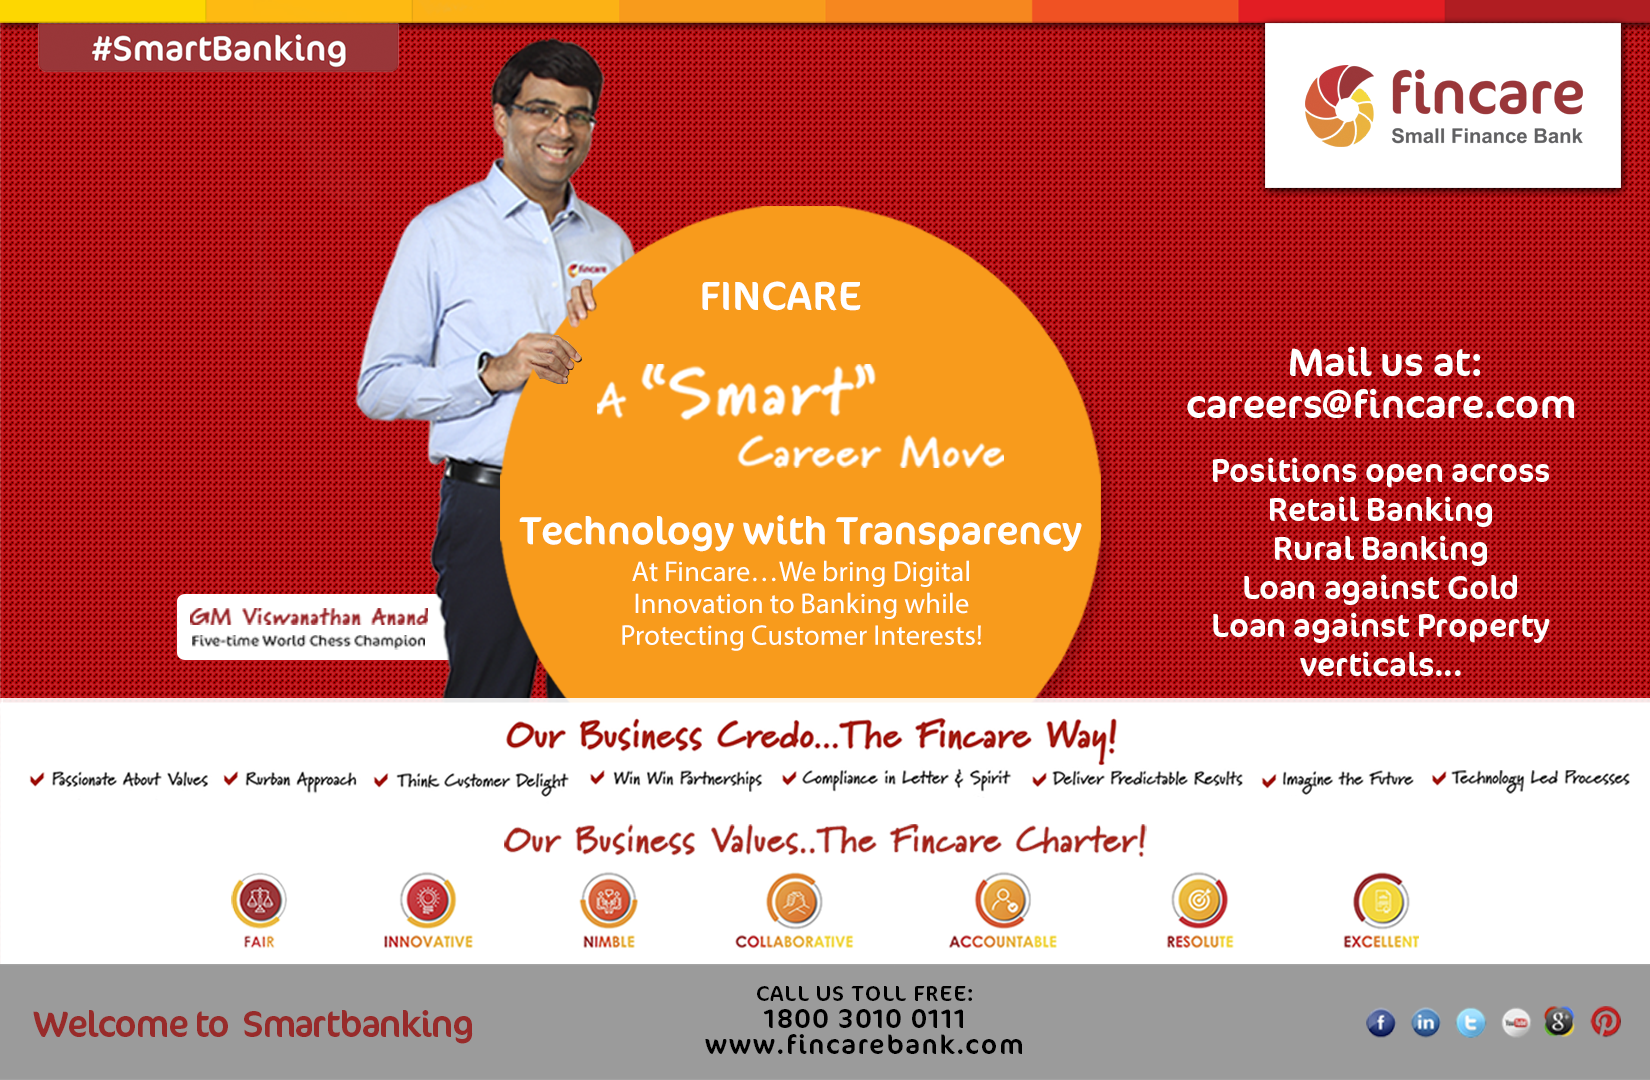 Fincare, a smart career move! At Fincare…We bring Digital